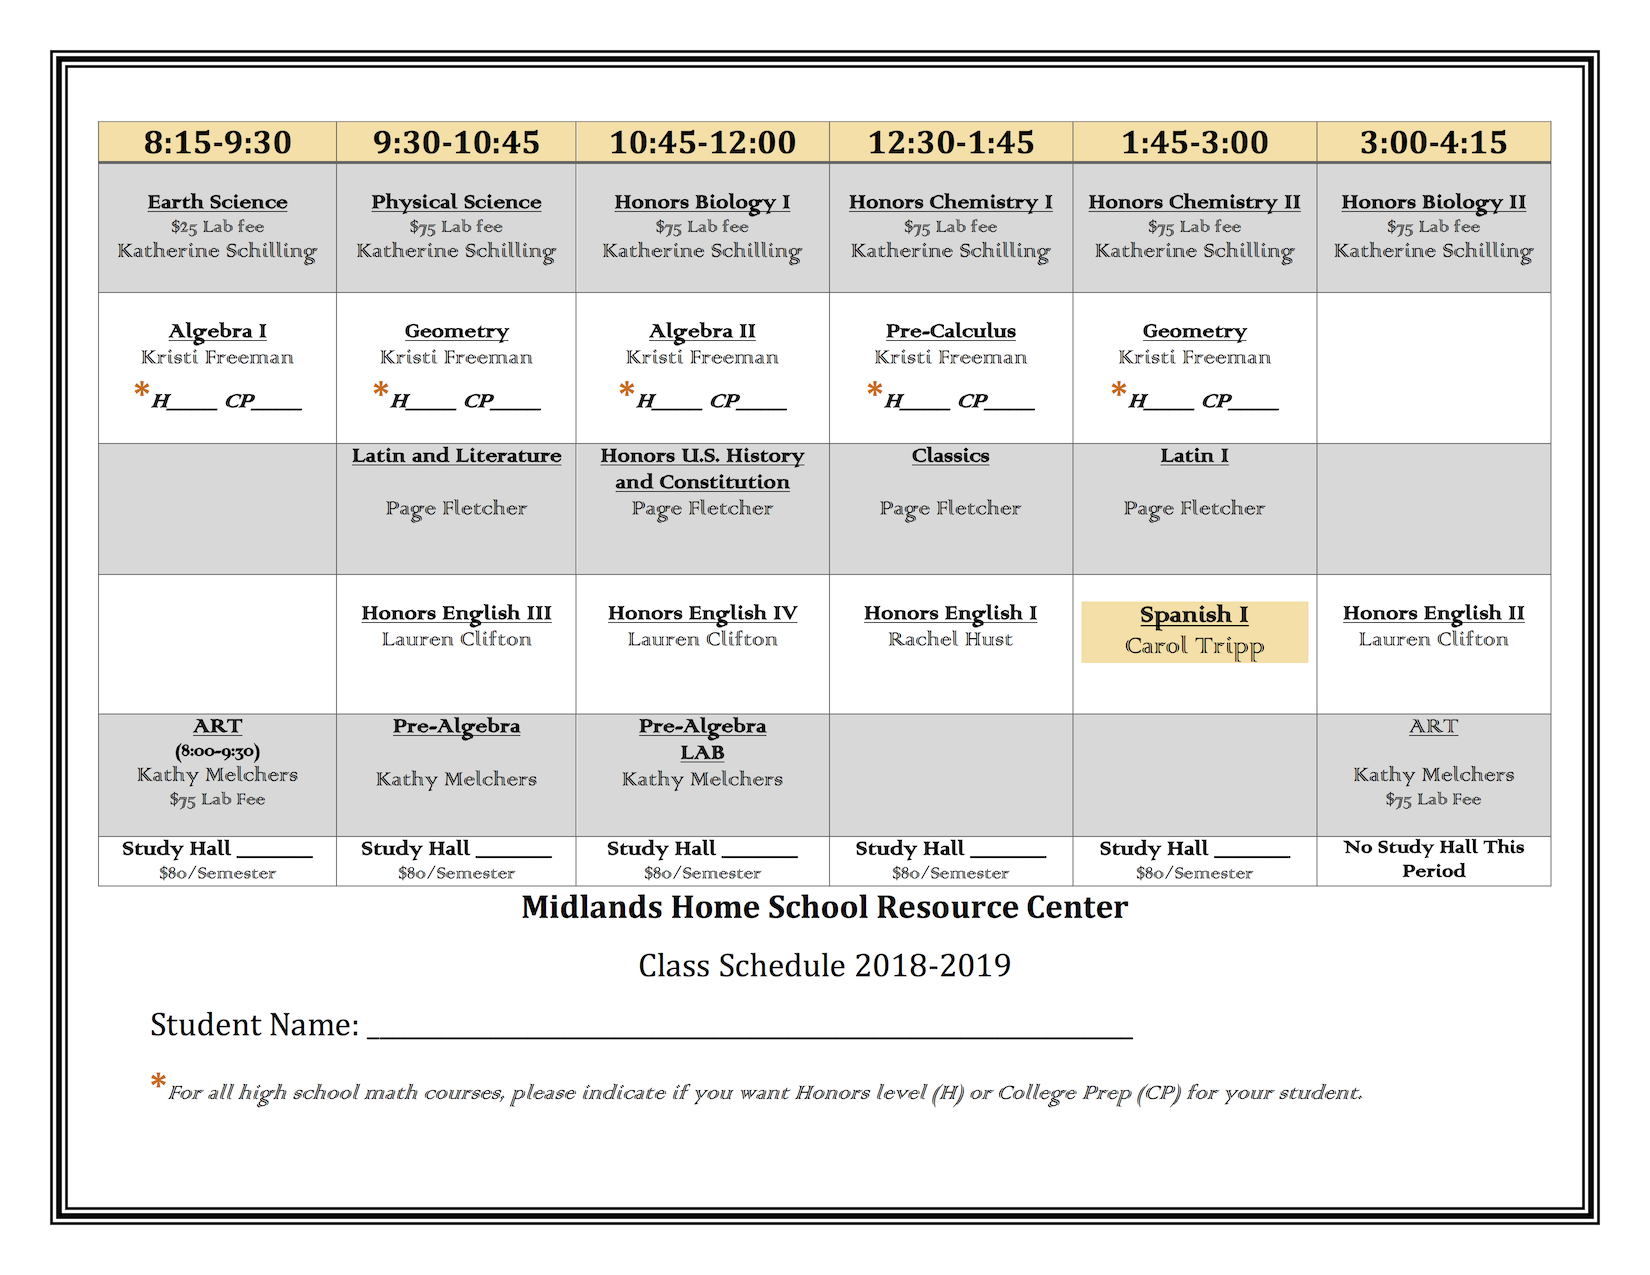 2018-2019 Class Schedule.png